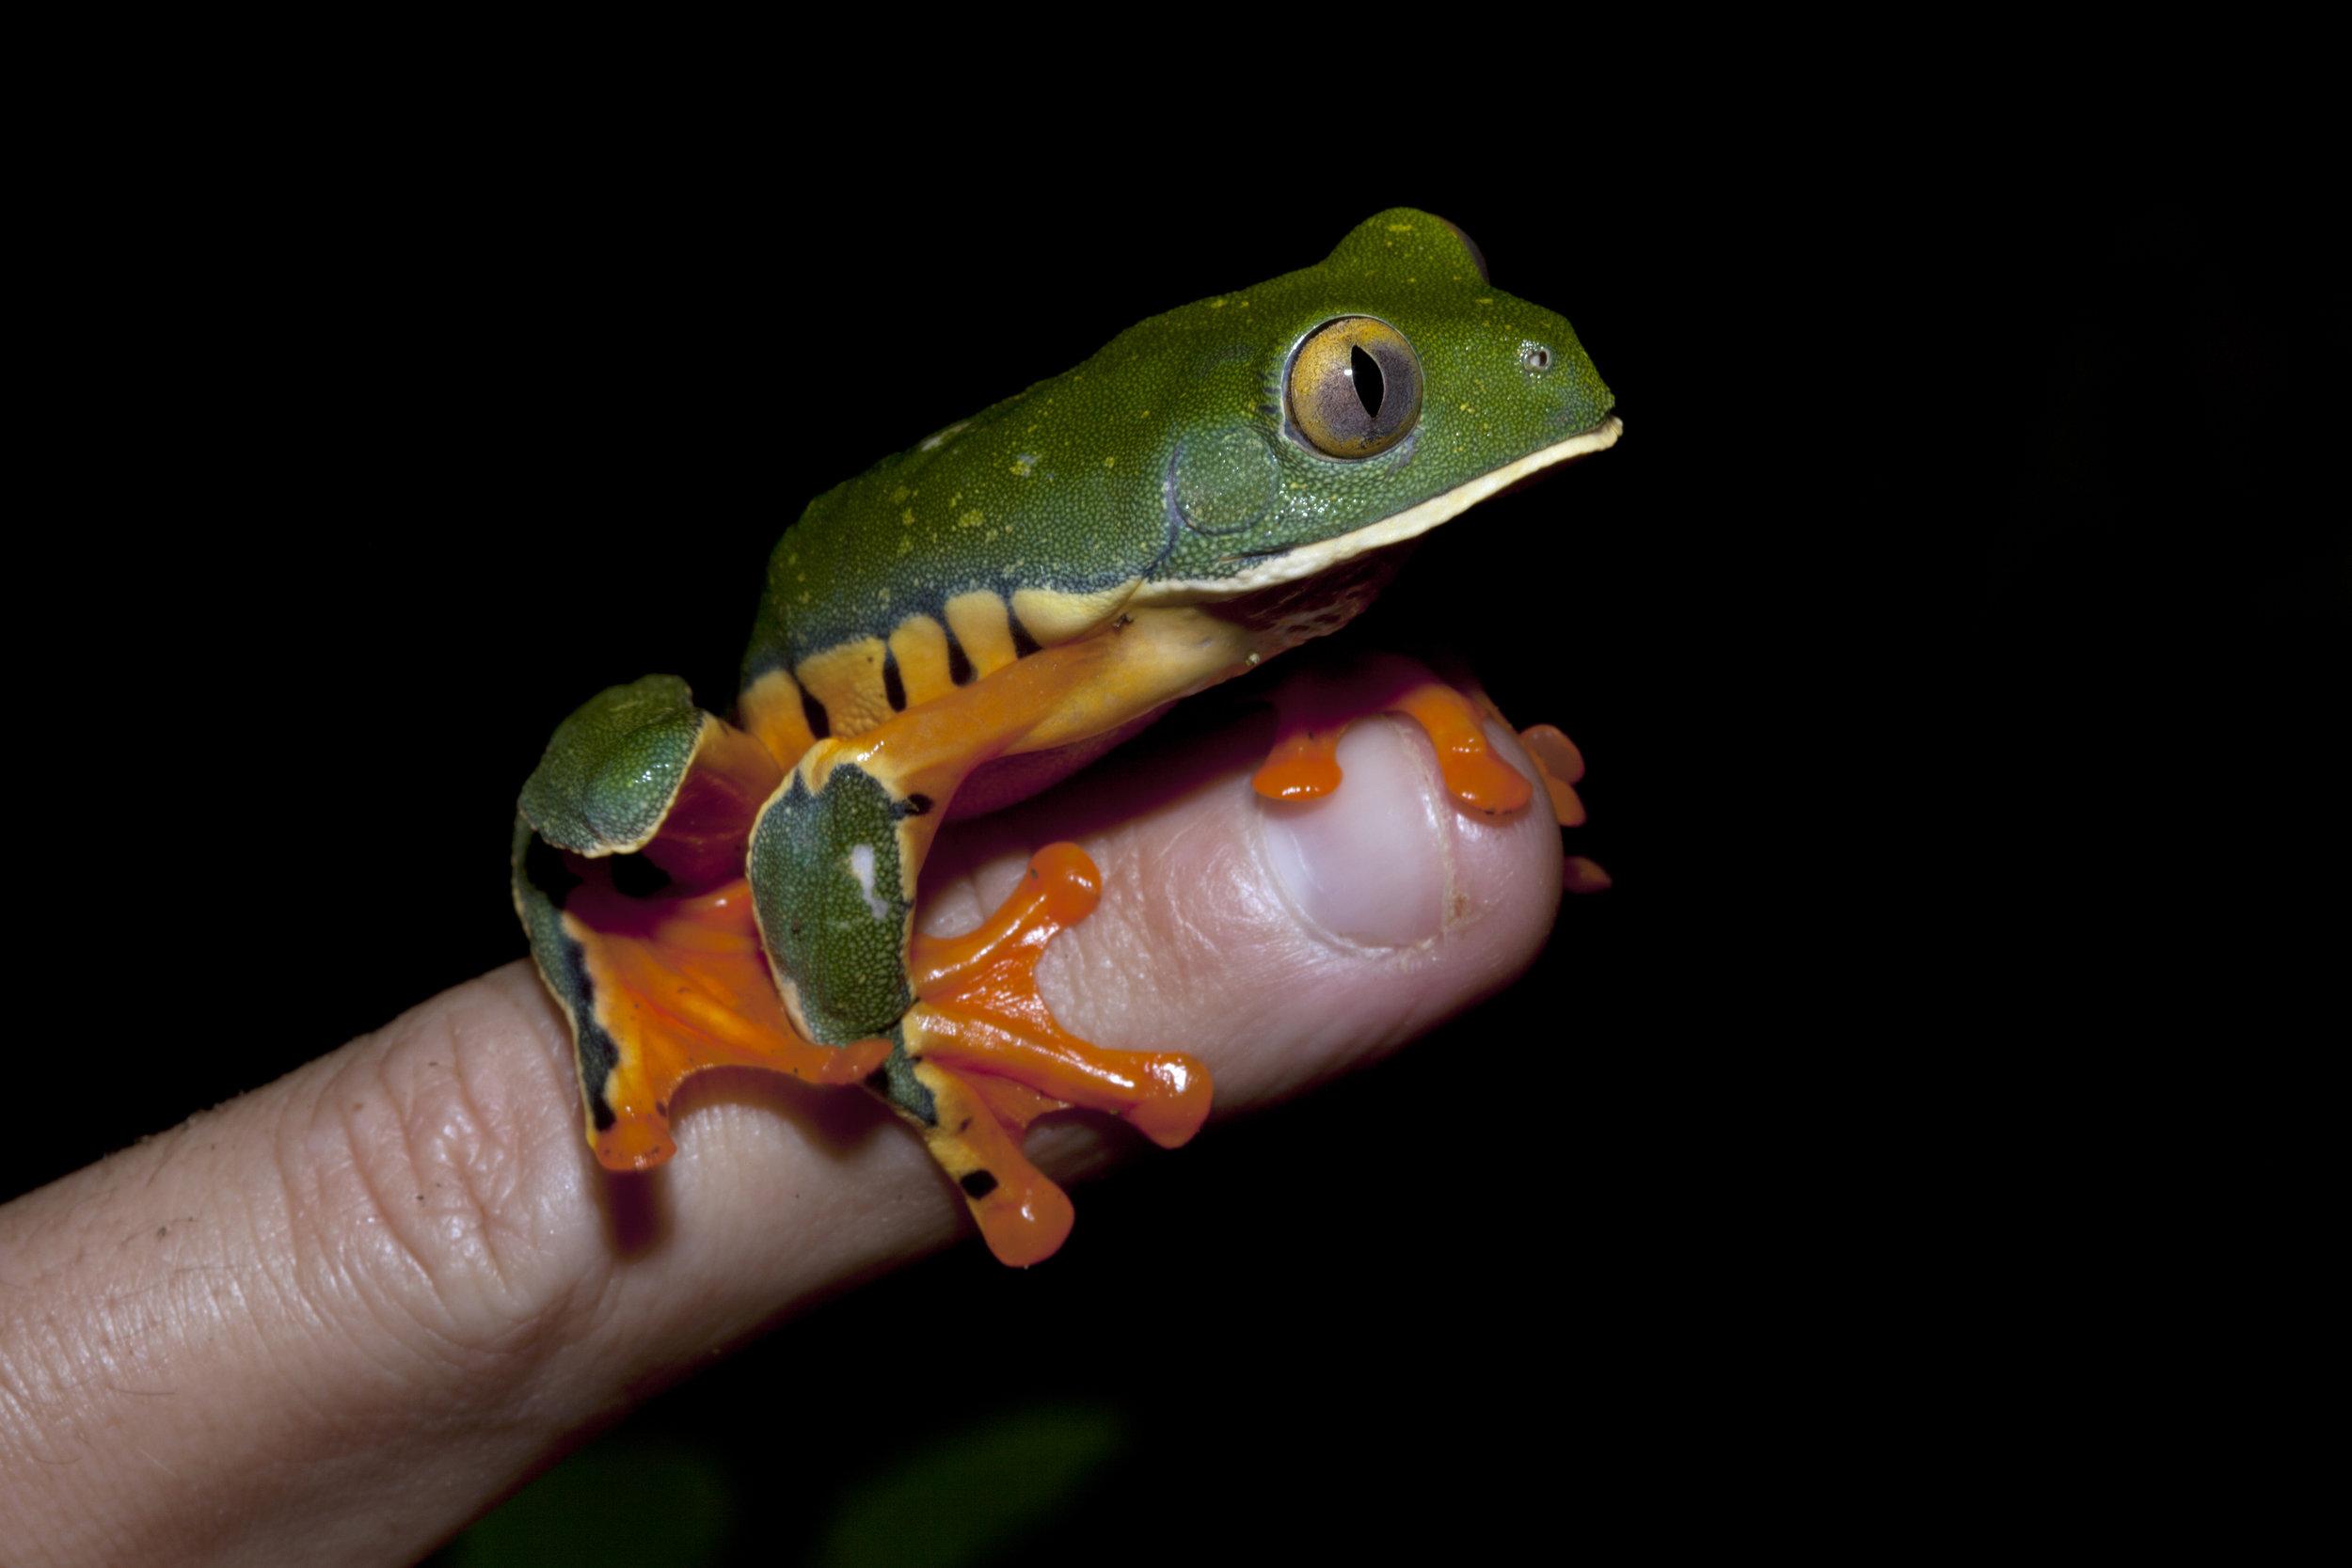 Agalychnis Calcarifer, Costa Rican Amphibian Research Center, Costa Rica